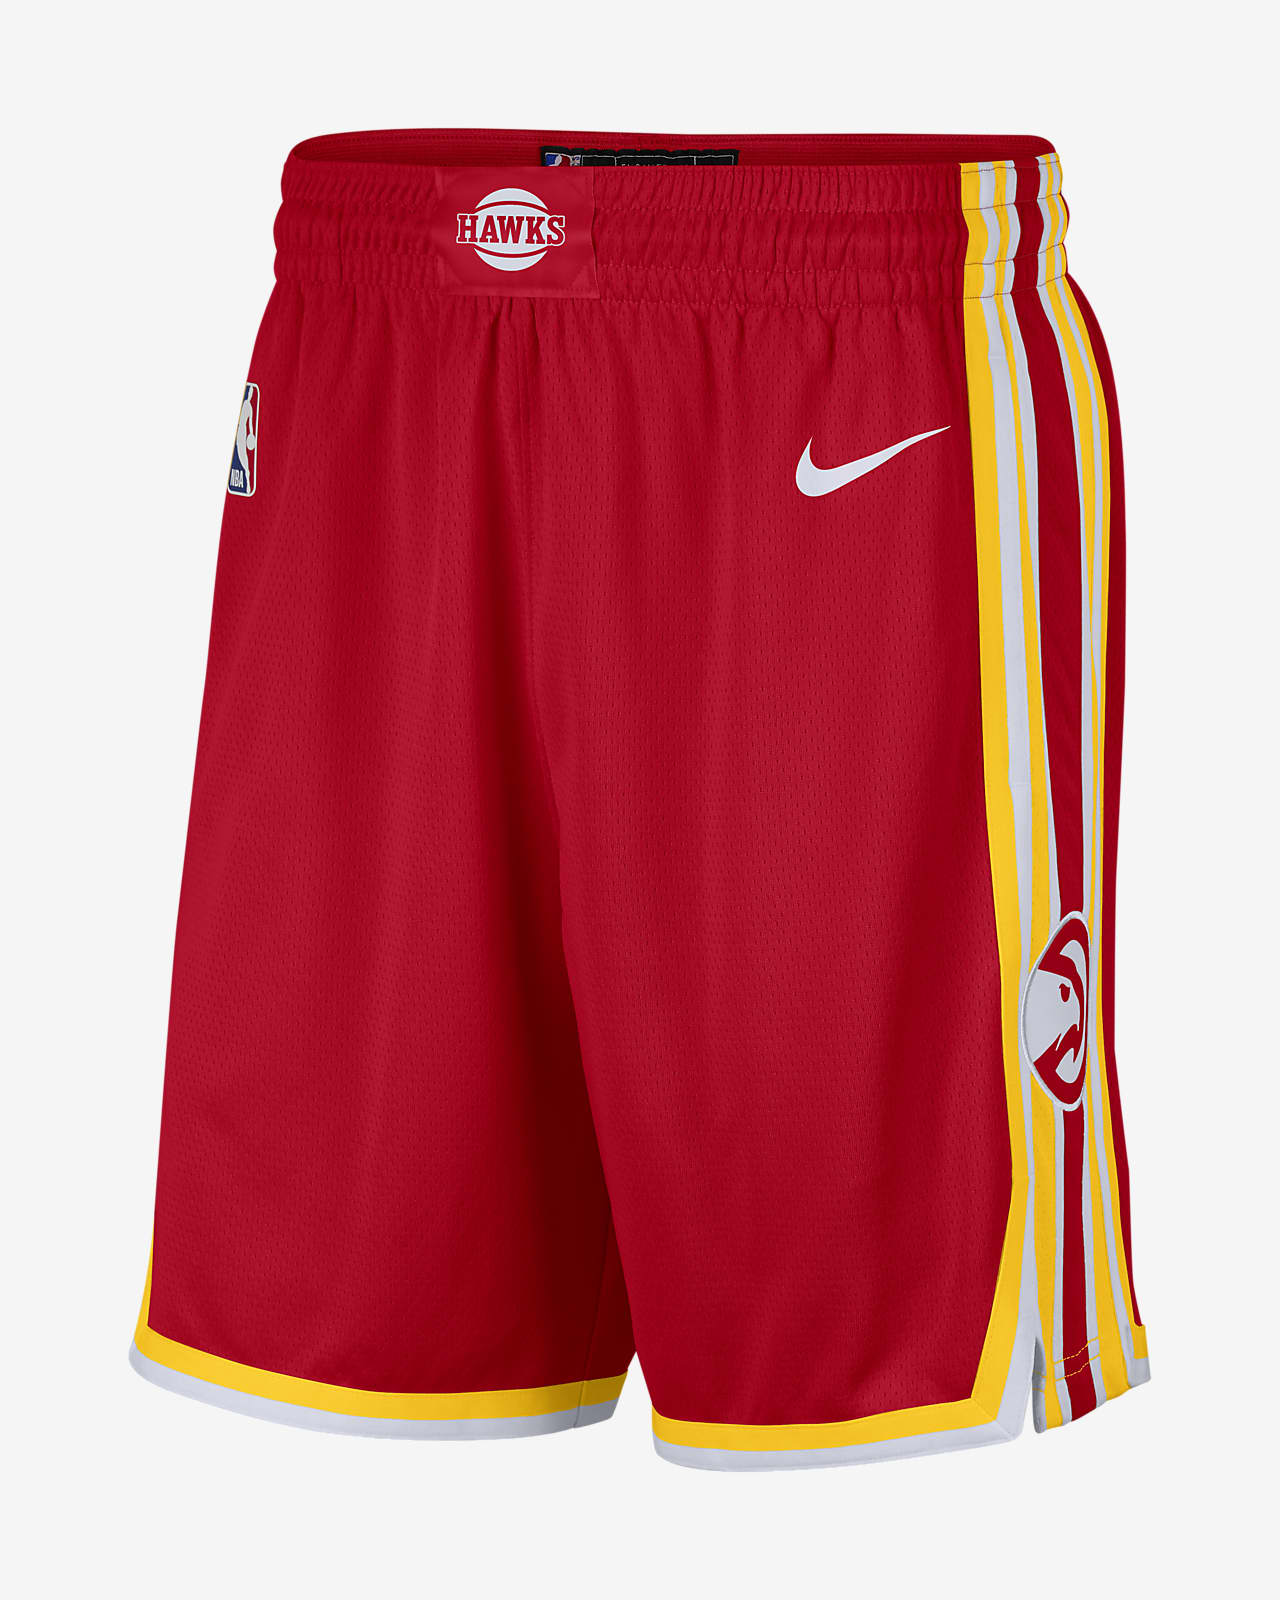 Hawks Icon Edition 2020 Men's Nike NBA Swingman Shorts